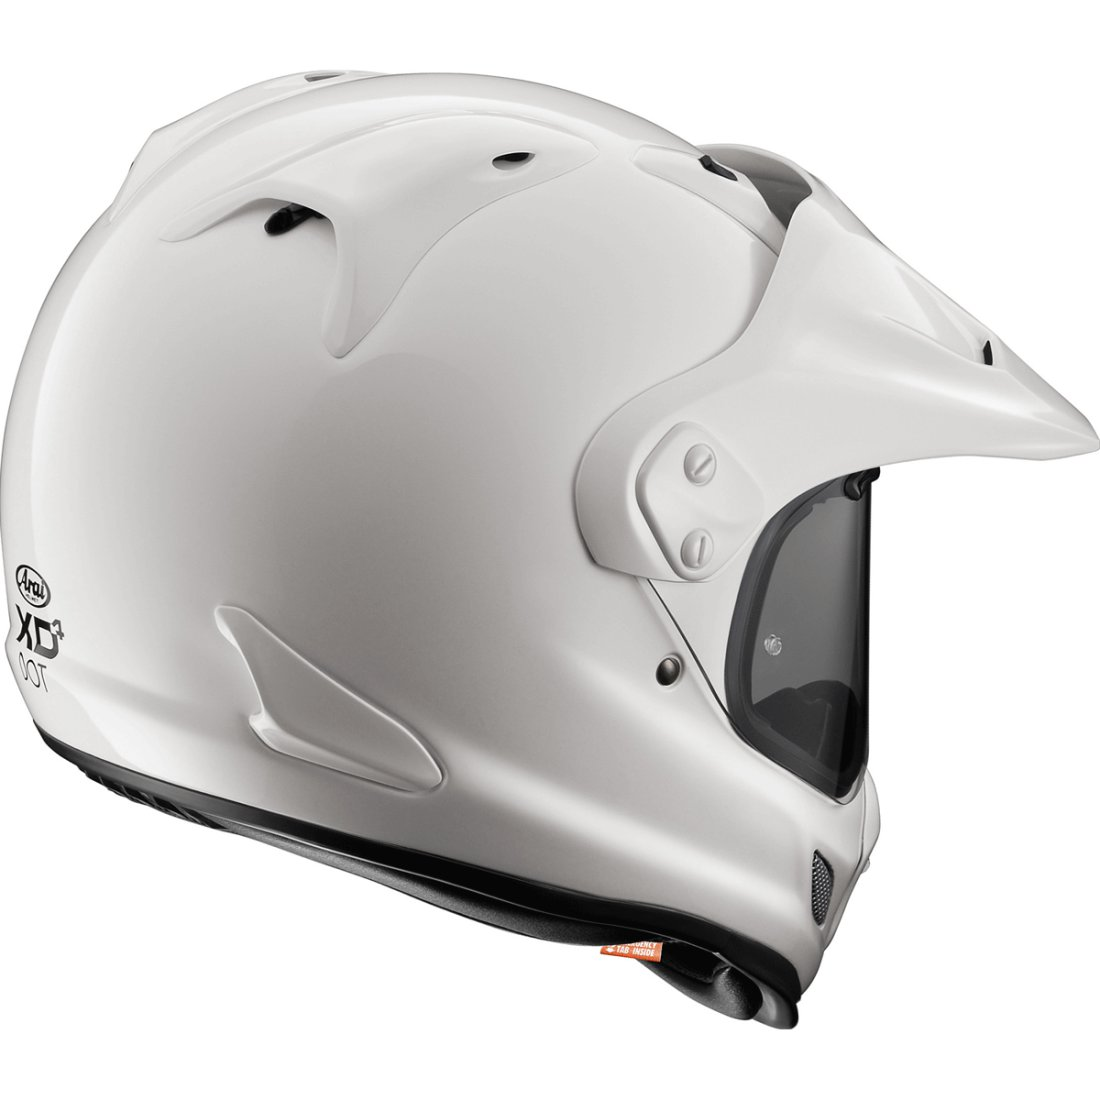 f98716b8e28da Casco ARAI TOUR-X 4 White · Motocard